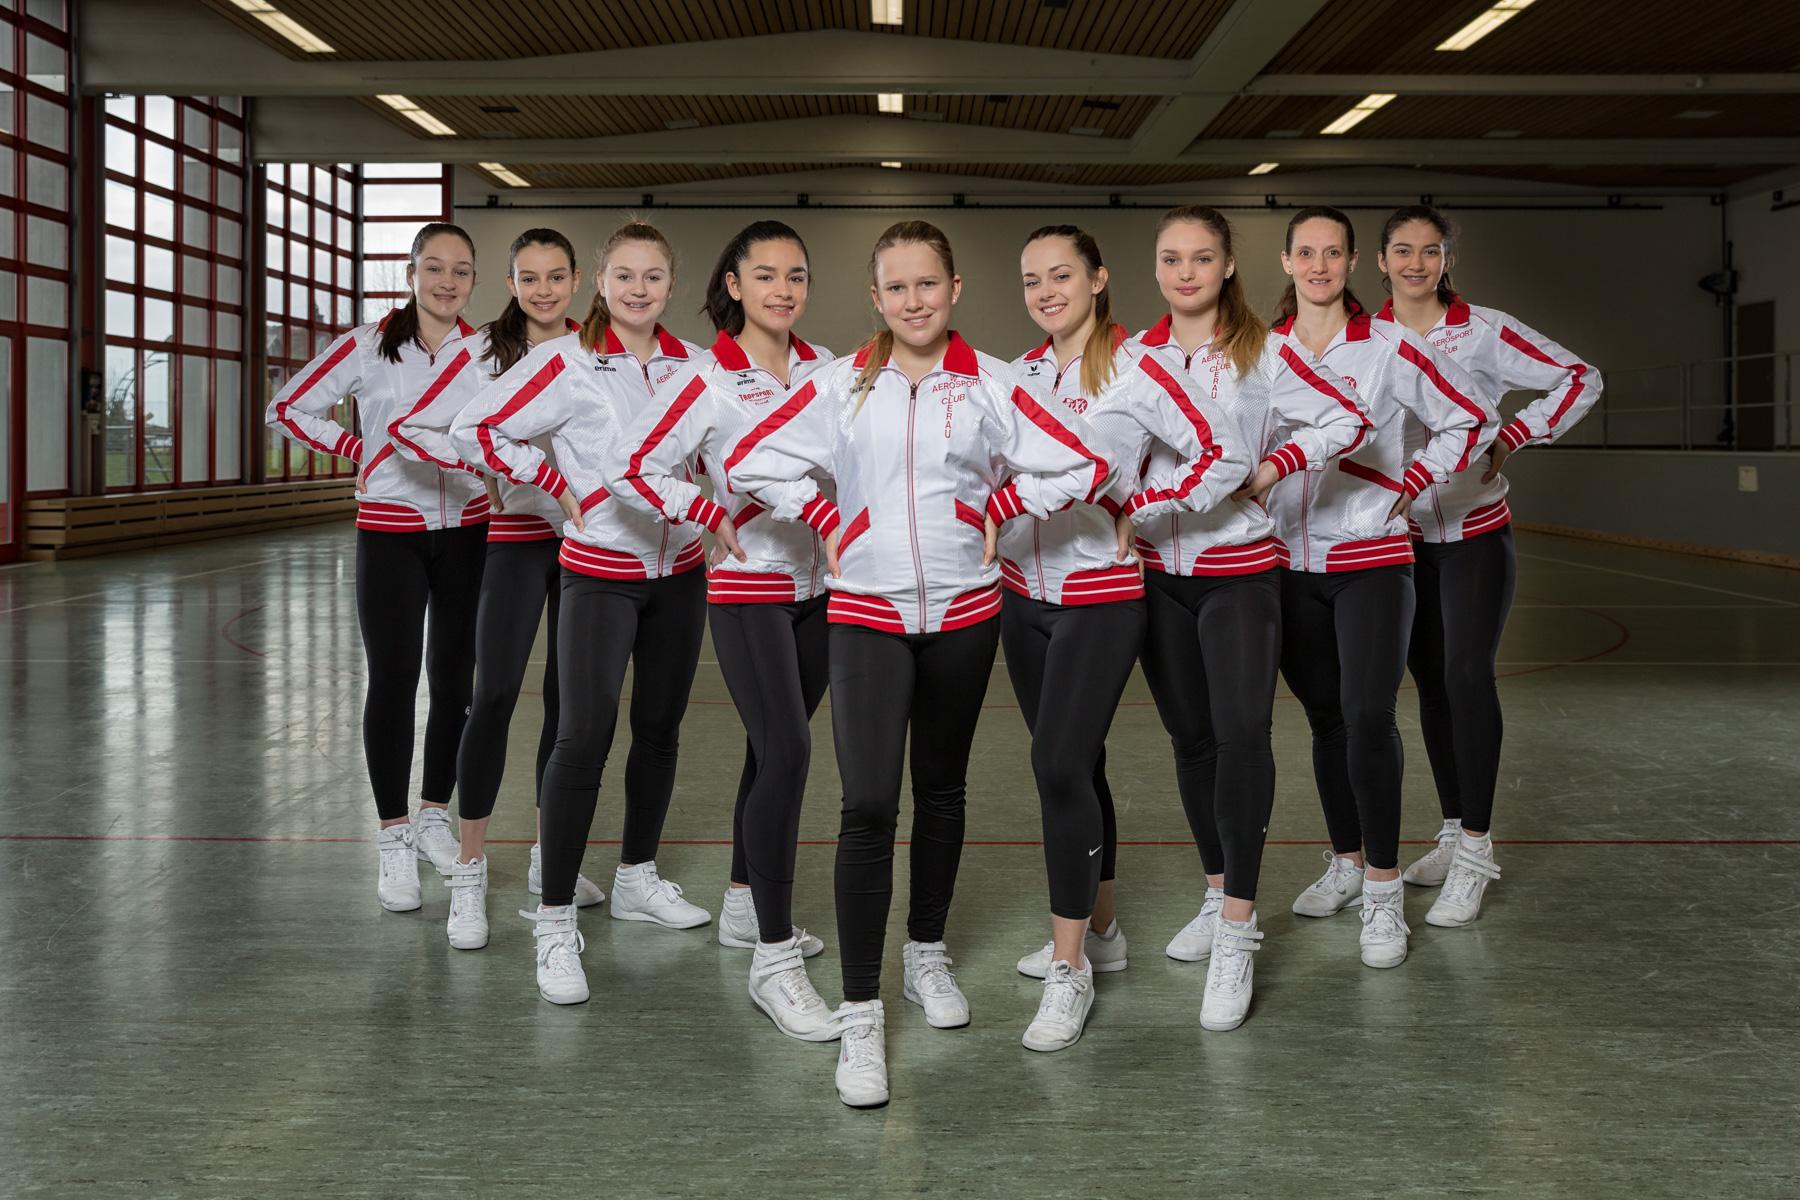 sport-teamfotos-fotograf-schweiz